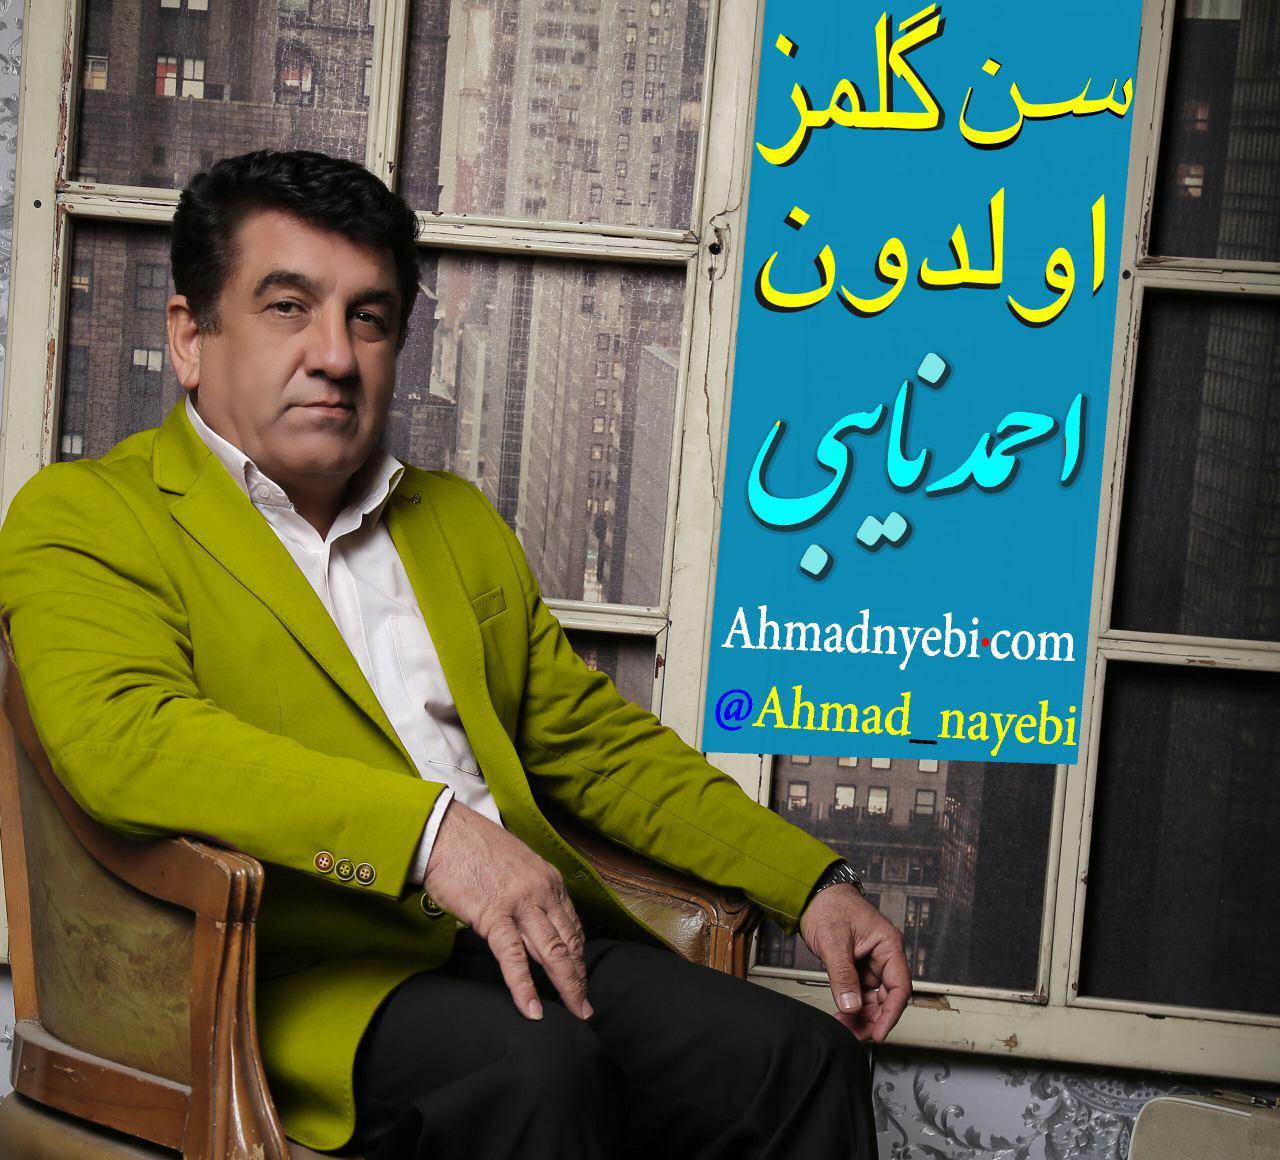 http://s8.picofile.com/file/8308728576/01Ahmad_Nayebi_San_Galmaz_Oldun.jpg